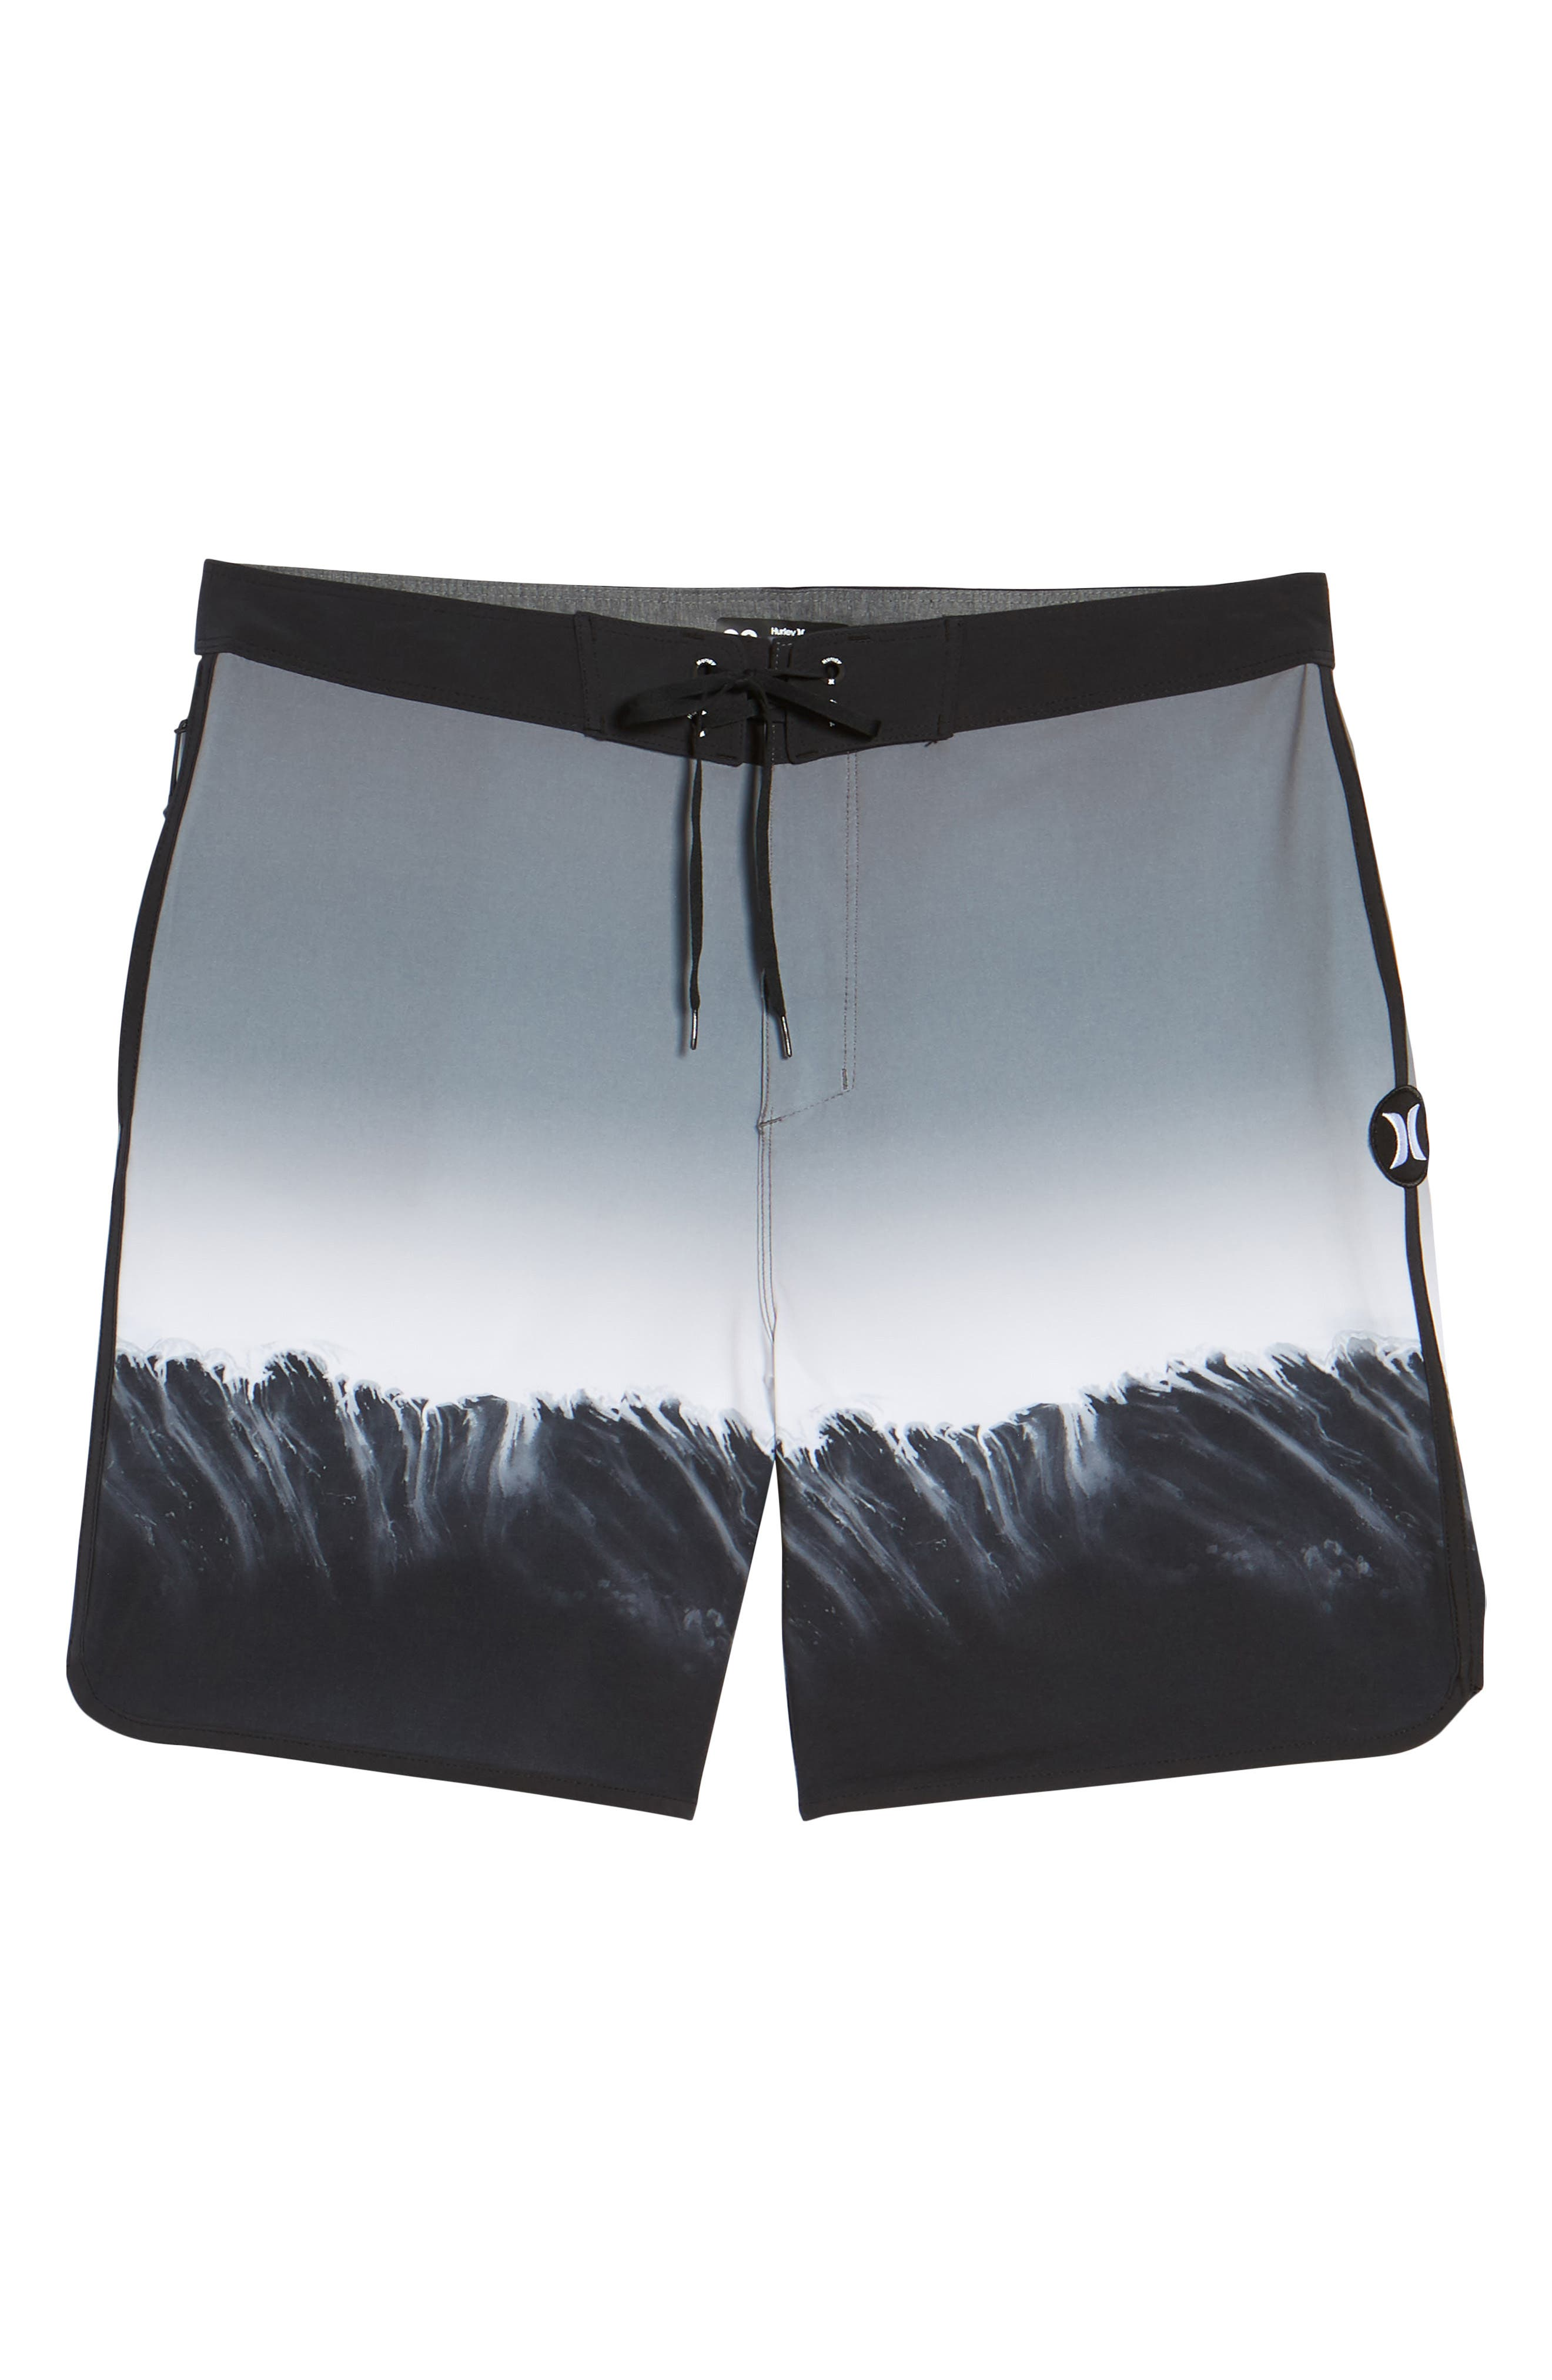 Phantom Estuary Board Shorts,                             Alternate thumbnail 6, color,                             010